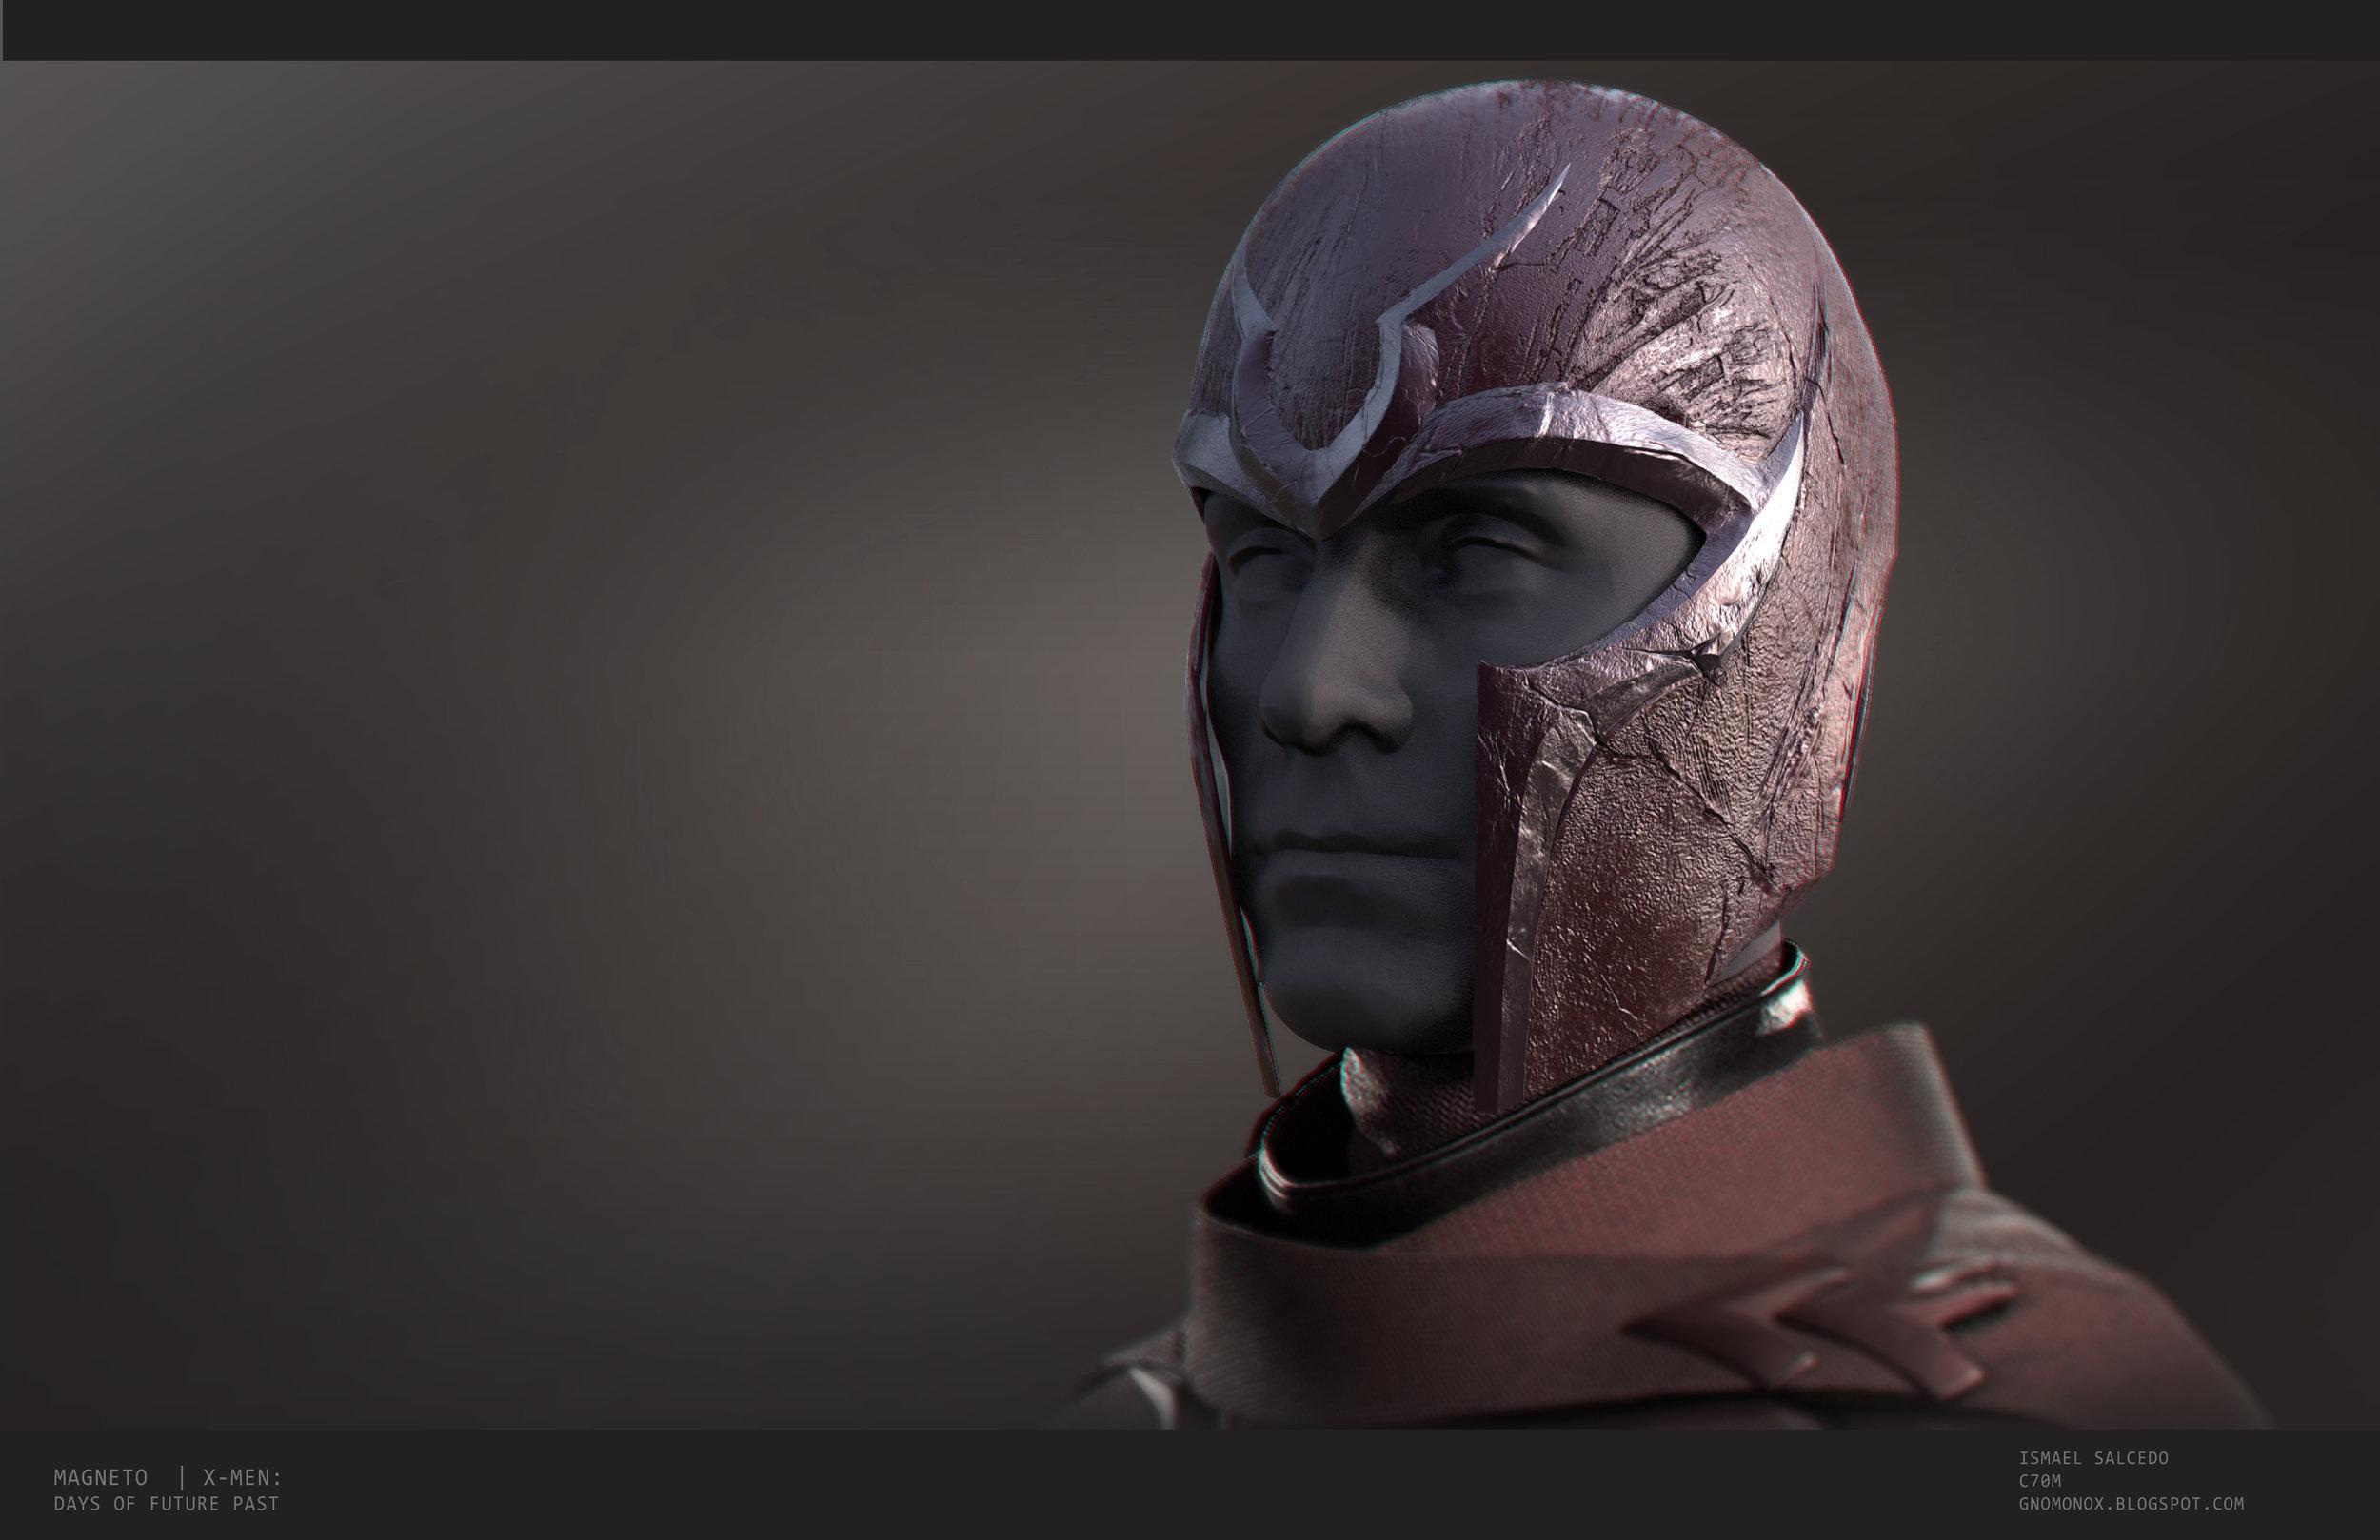 Ismael_C70M_3D_Magneto_Final.jpg